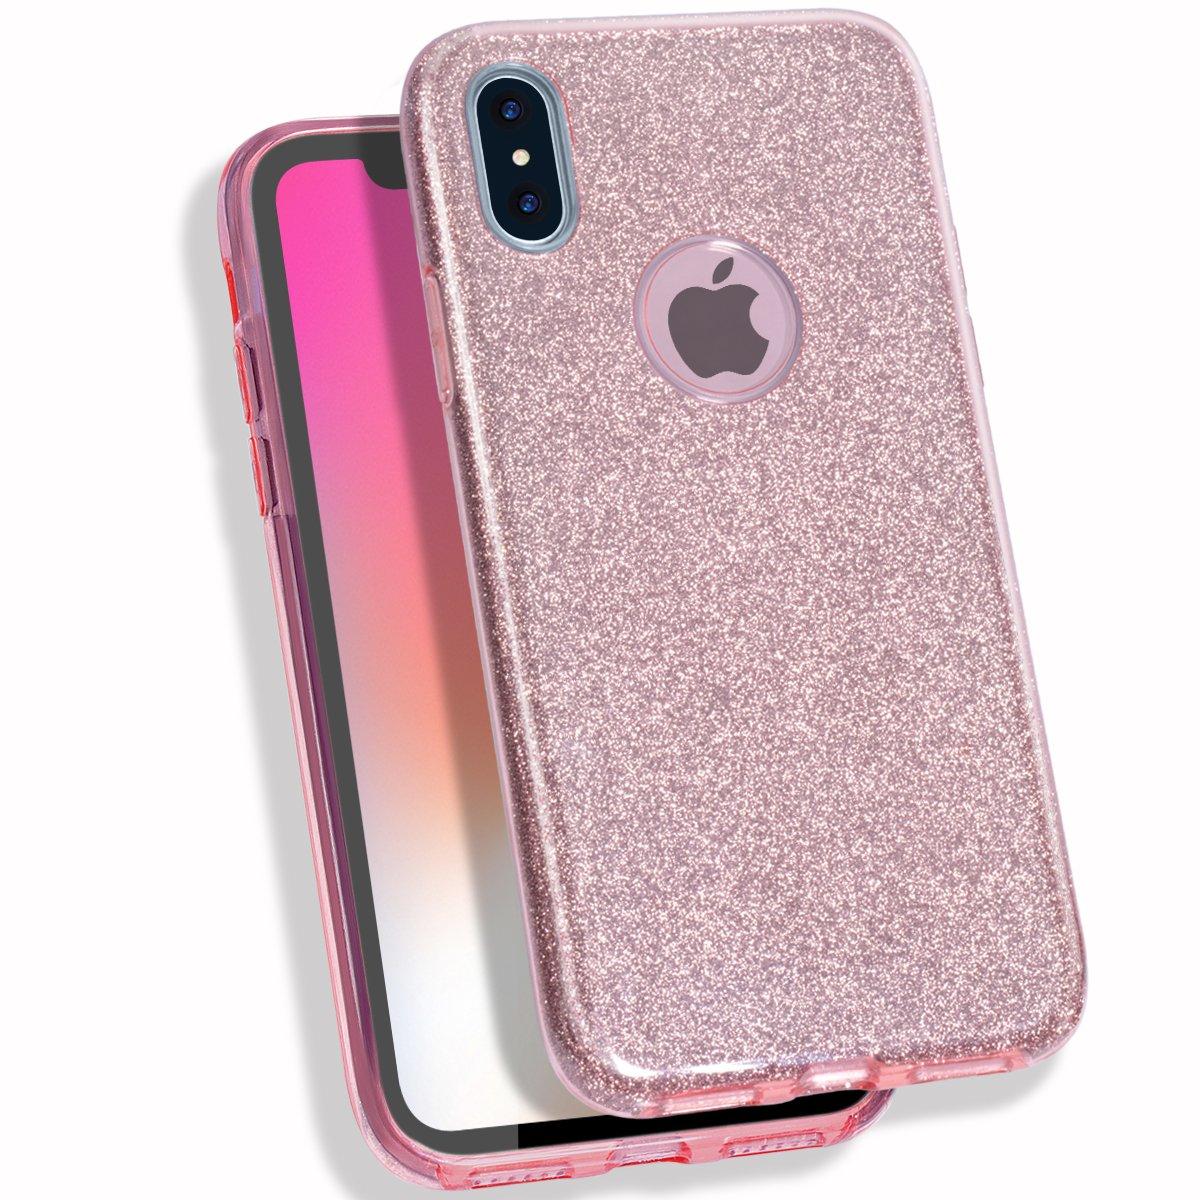 mateprox iphone xs case